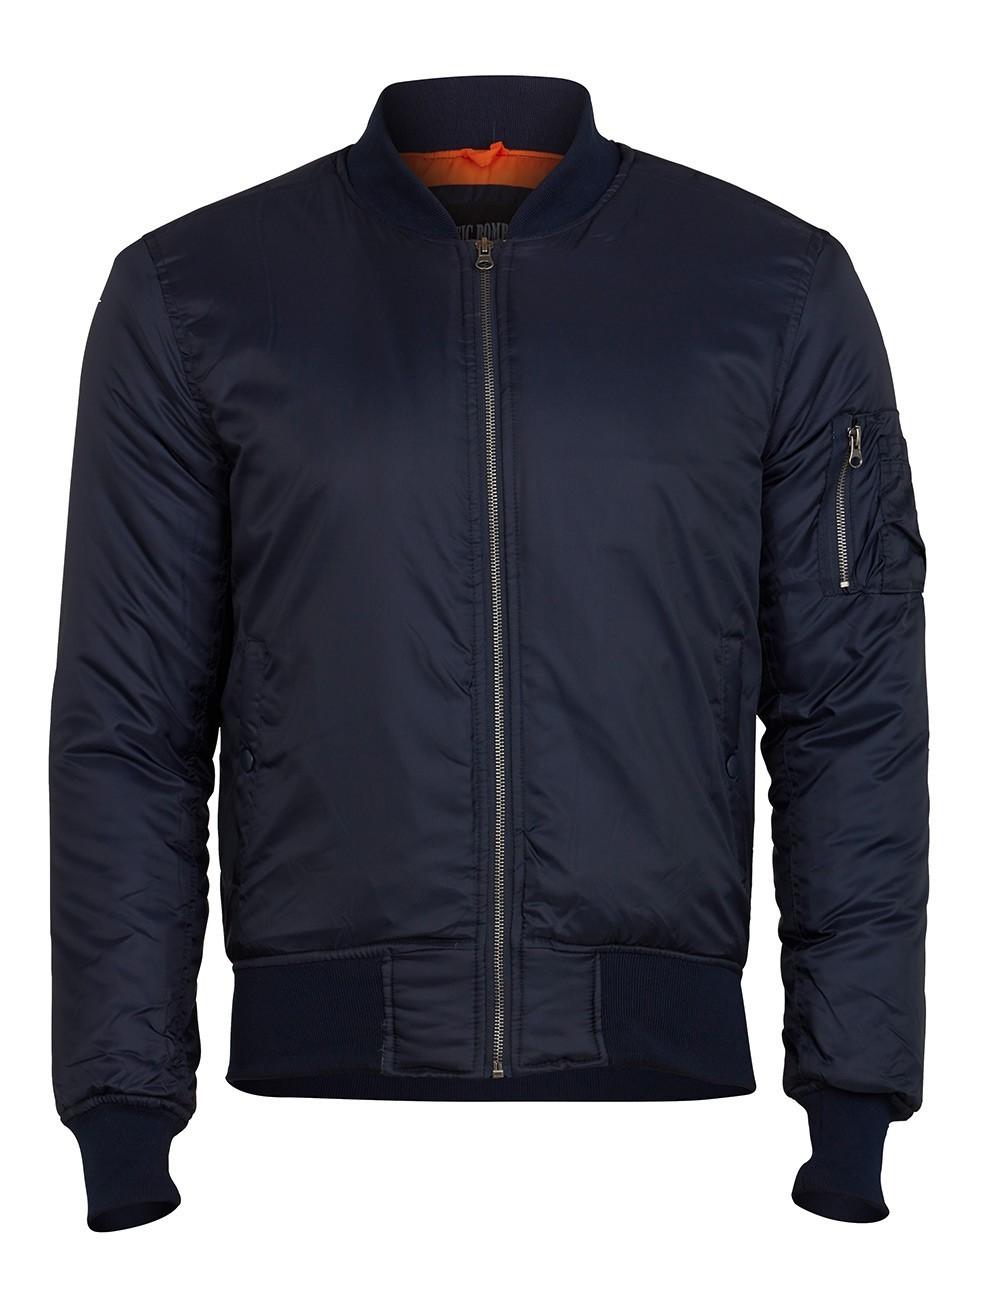 Куртка Бомбер - MA-1 Surplus Basic Bomber (т.синяя- navy)